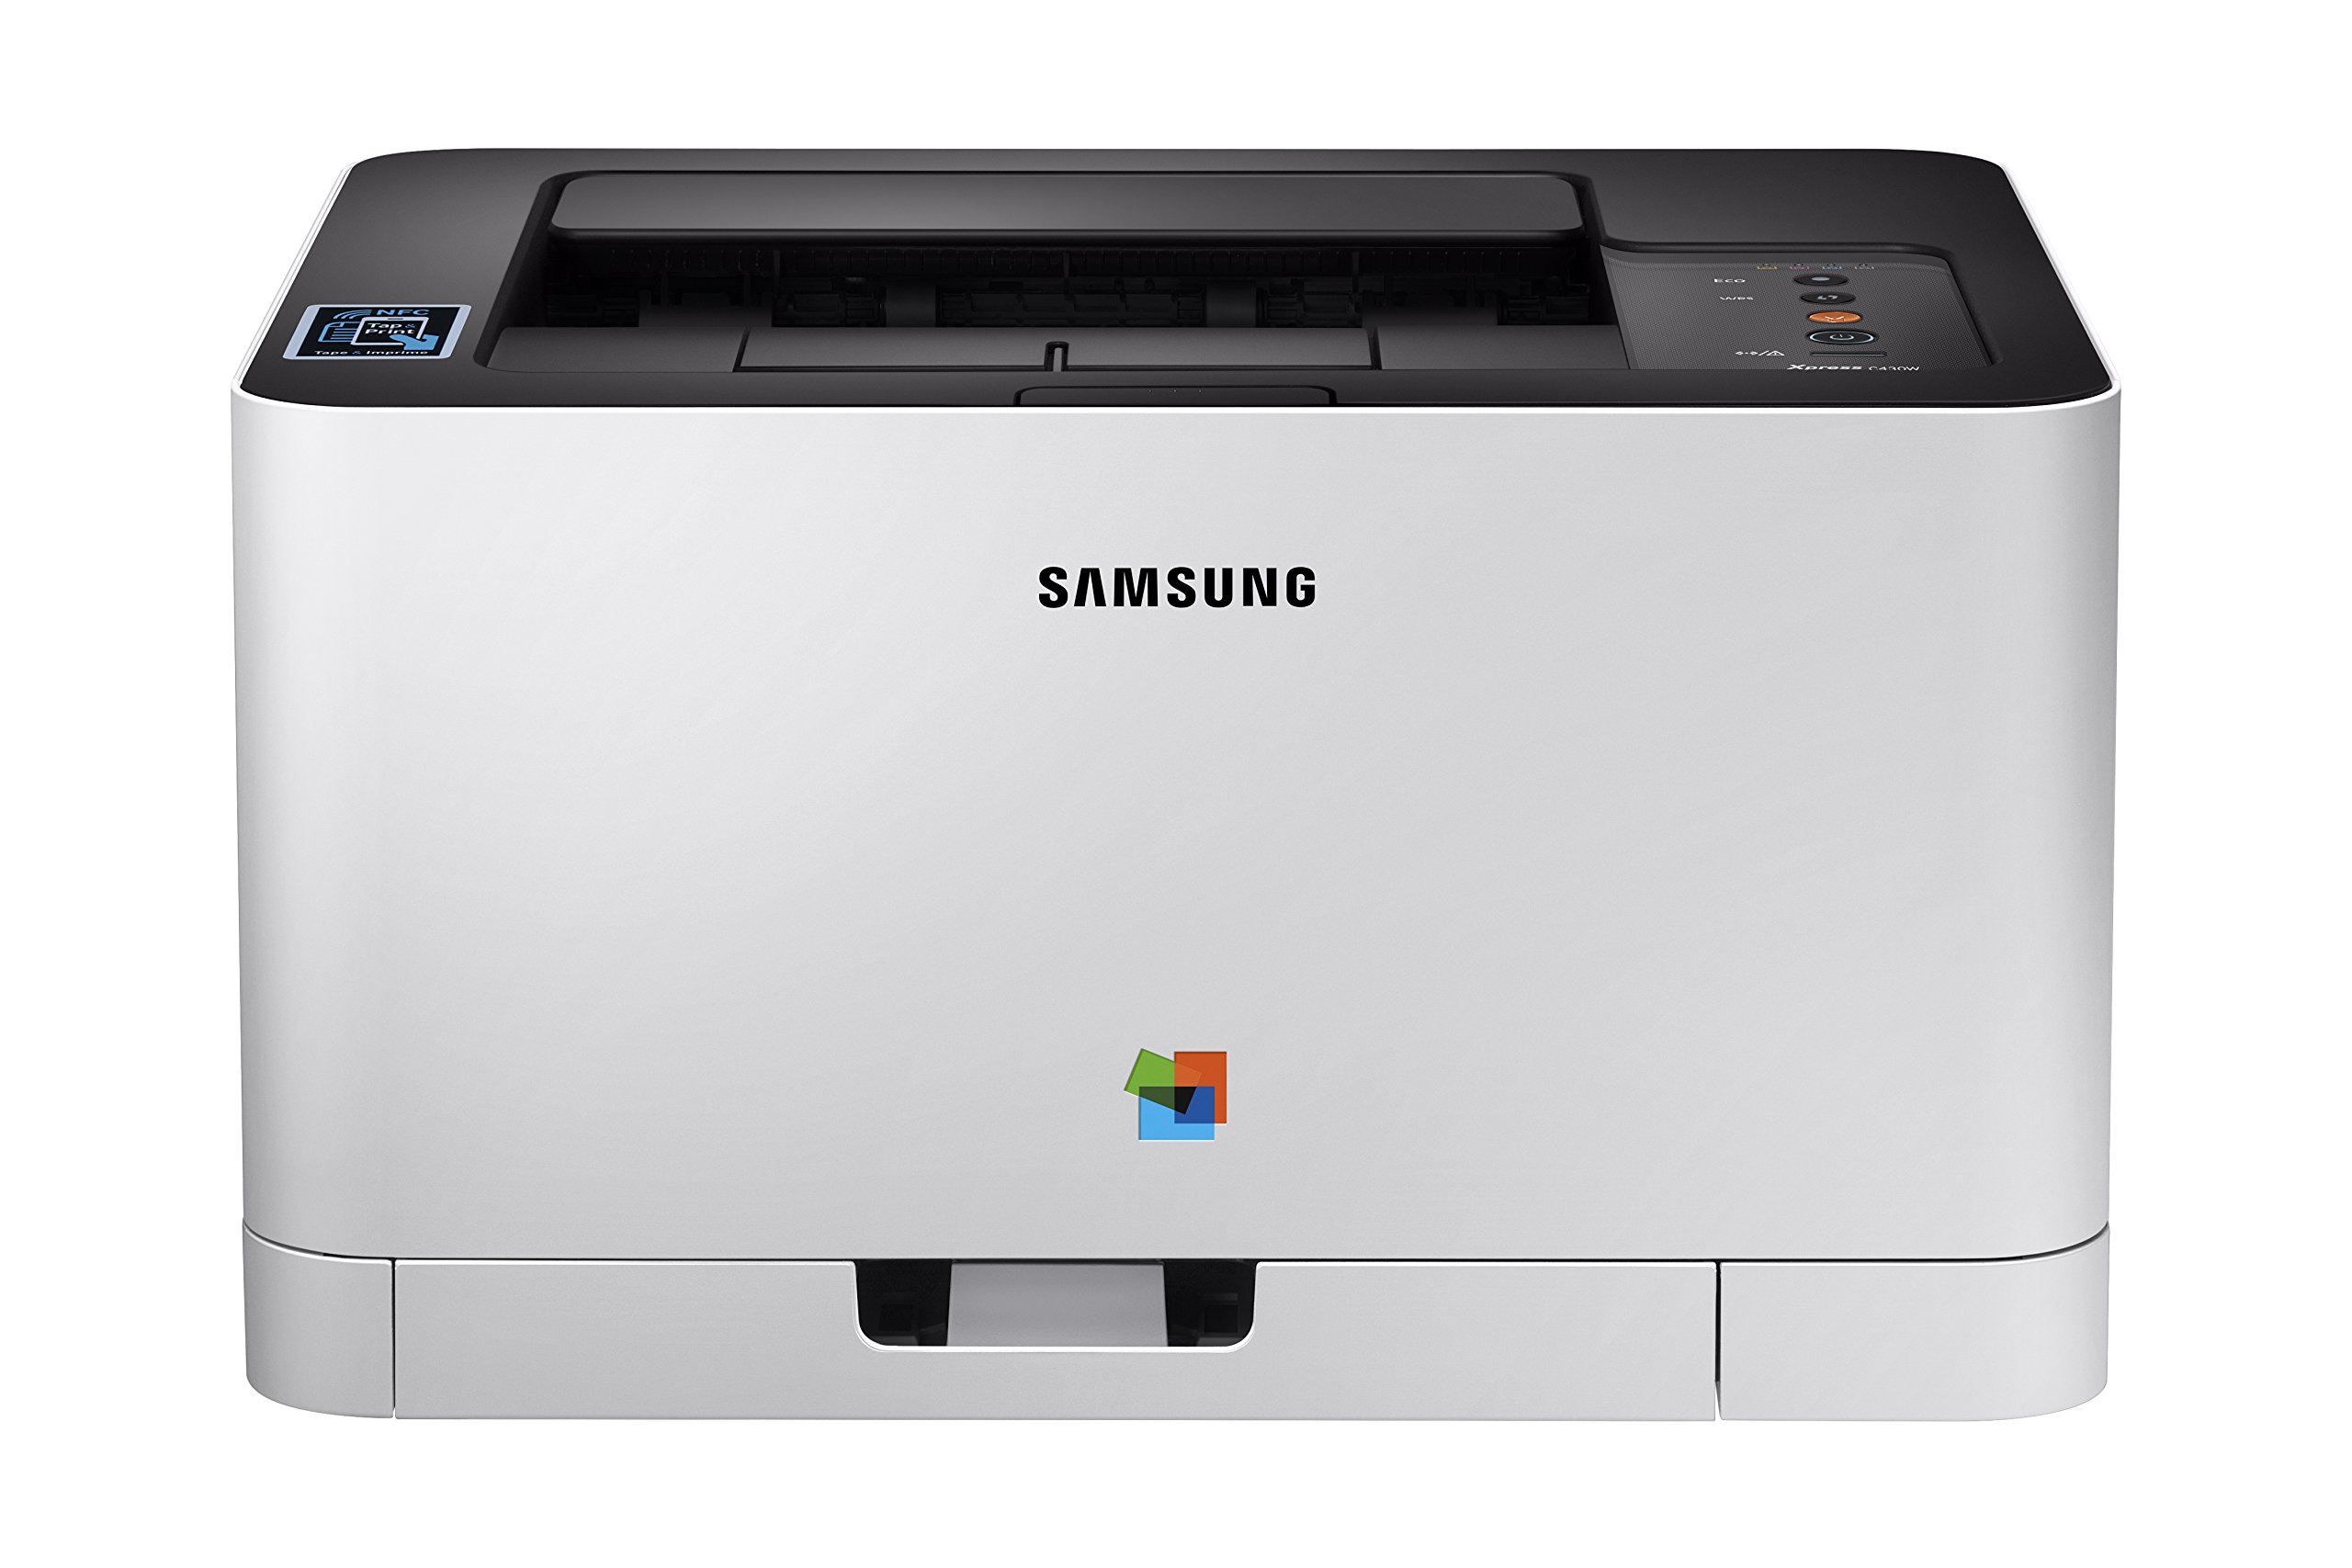 Samsung Electronics Xpress SL-C430W/XAA Wireless Color Printer, Amazon Dash Replenishment Enabled (SS230G)